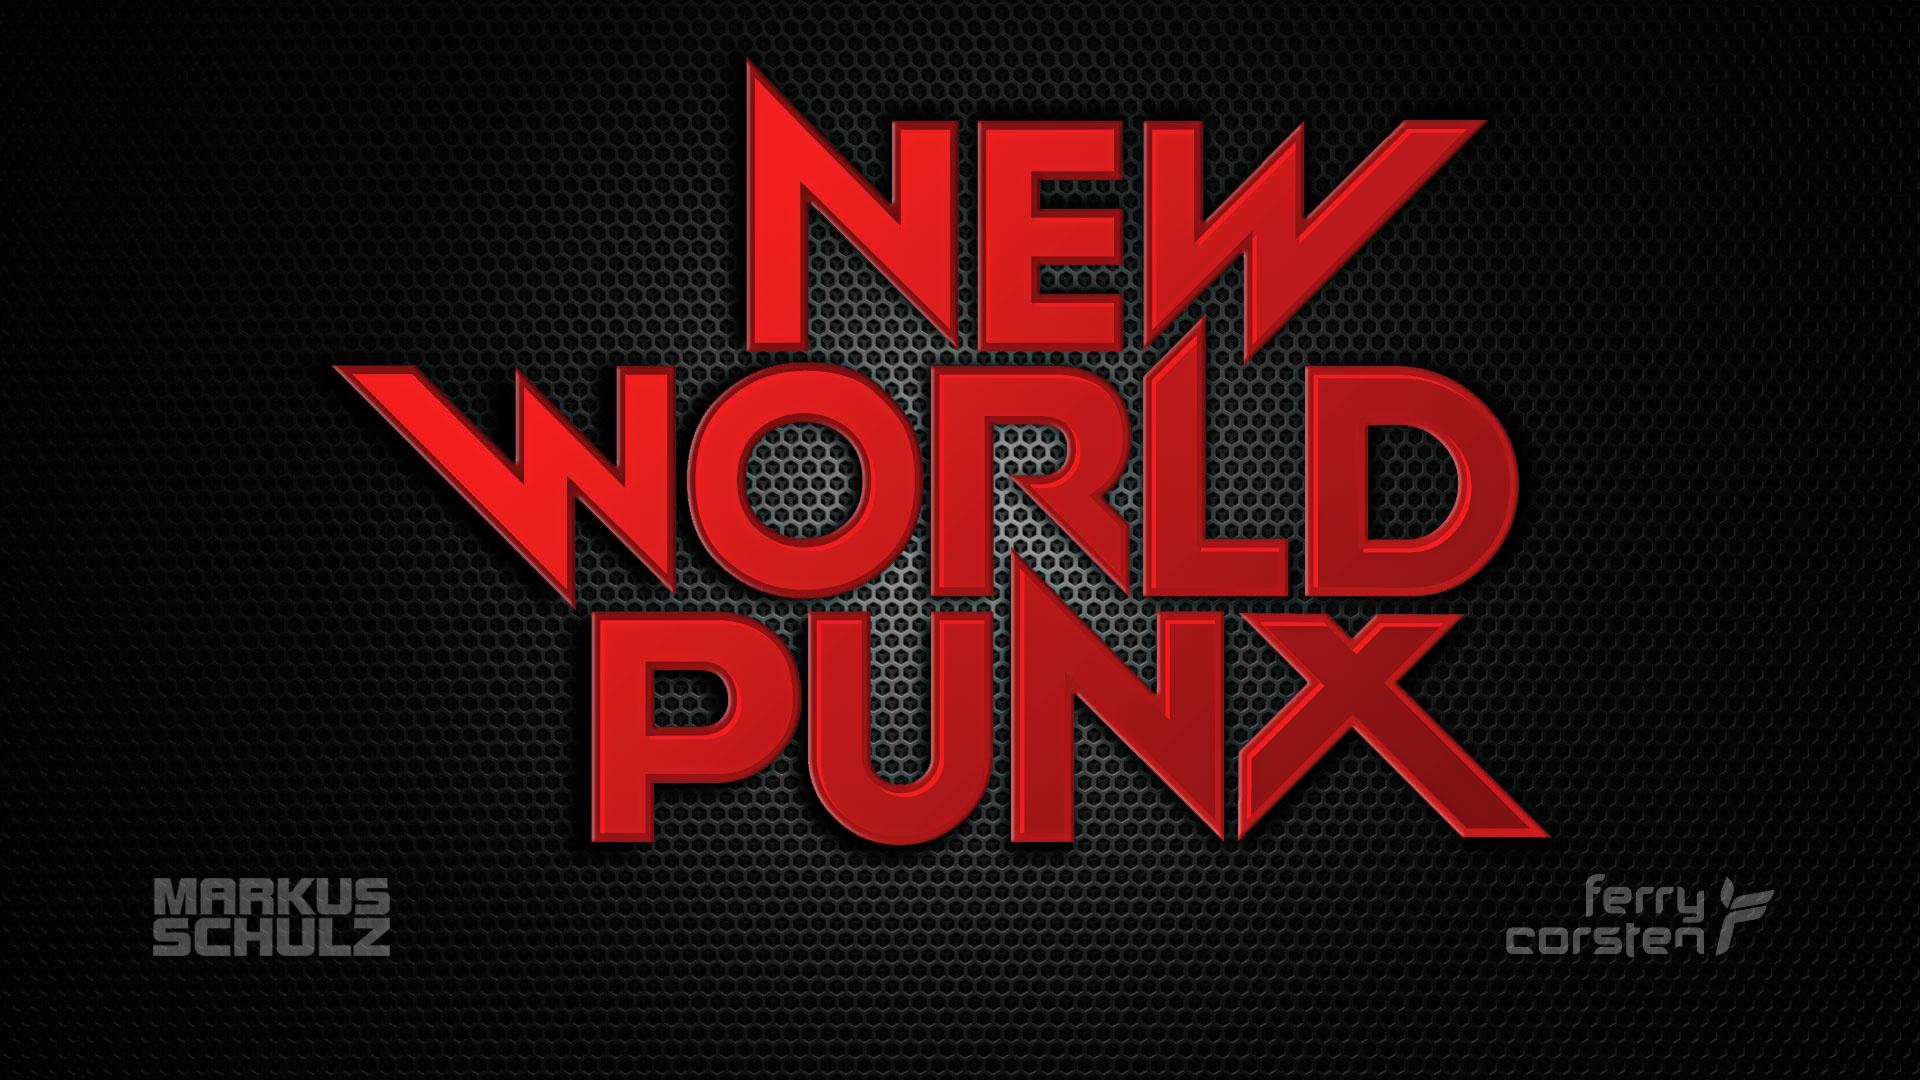 Ferry Corsten Markus Schulz New World Punx Trance 1920x1080